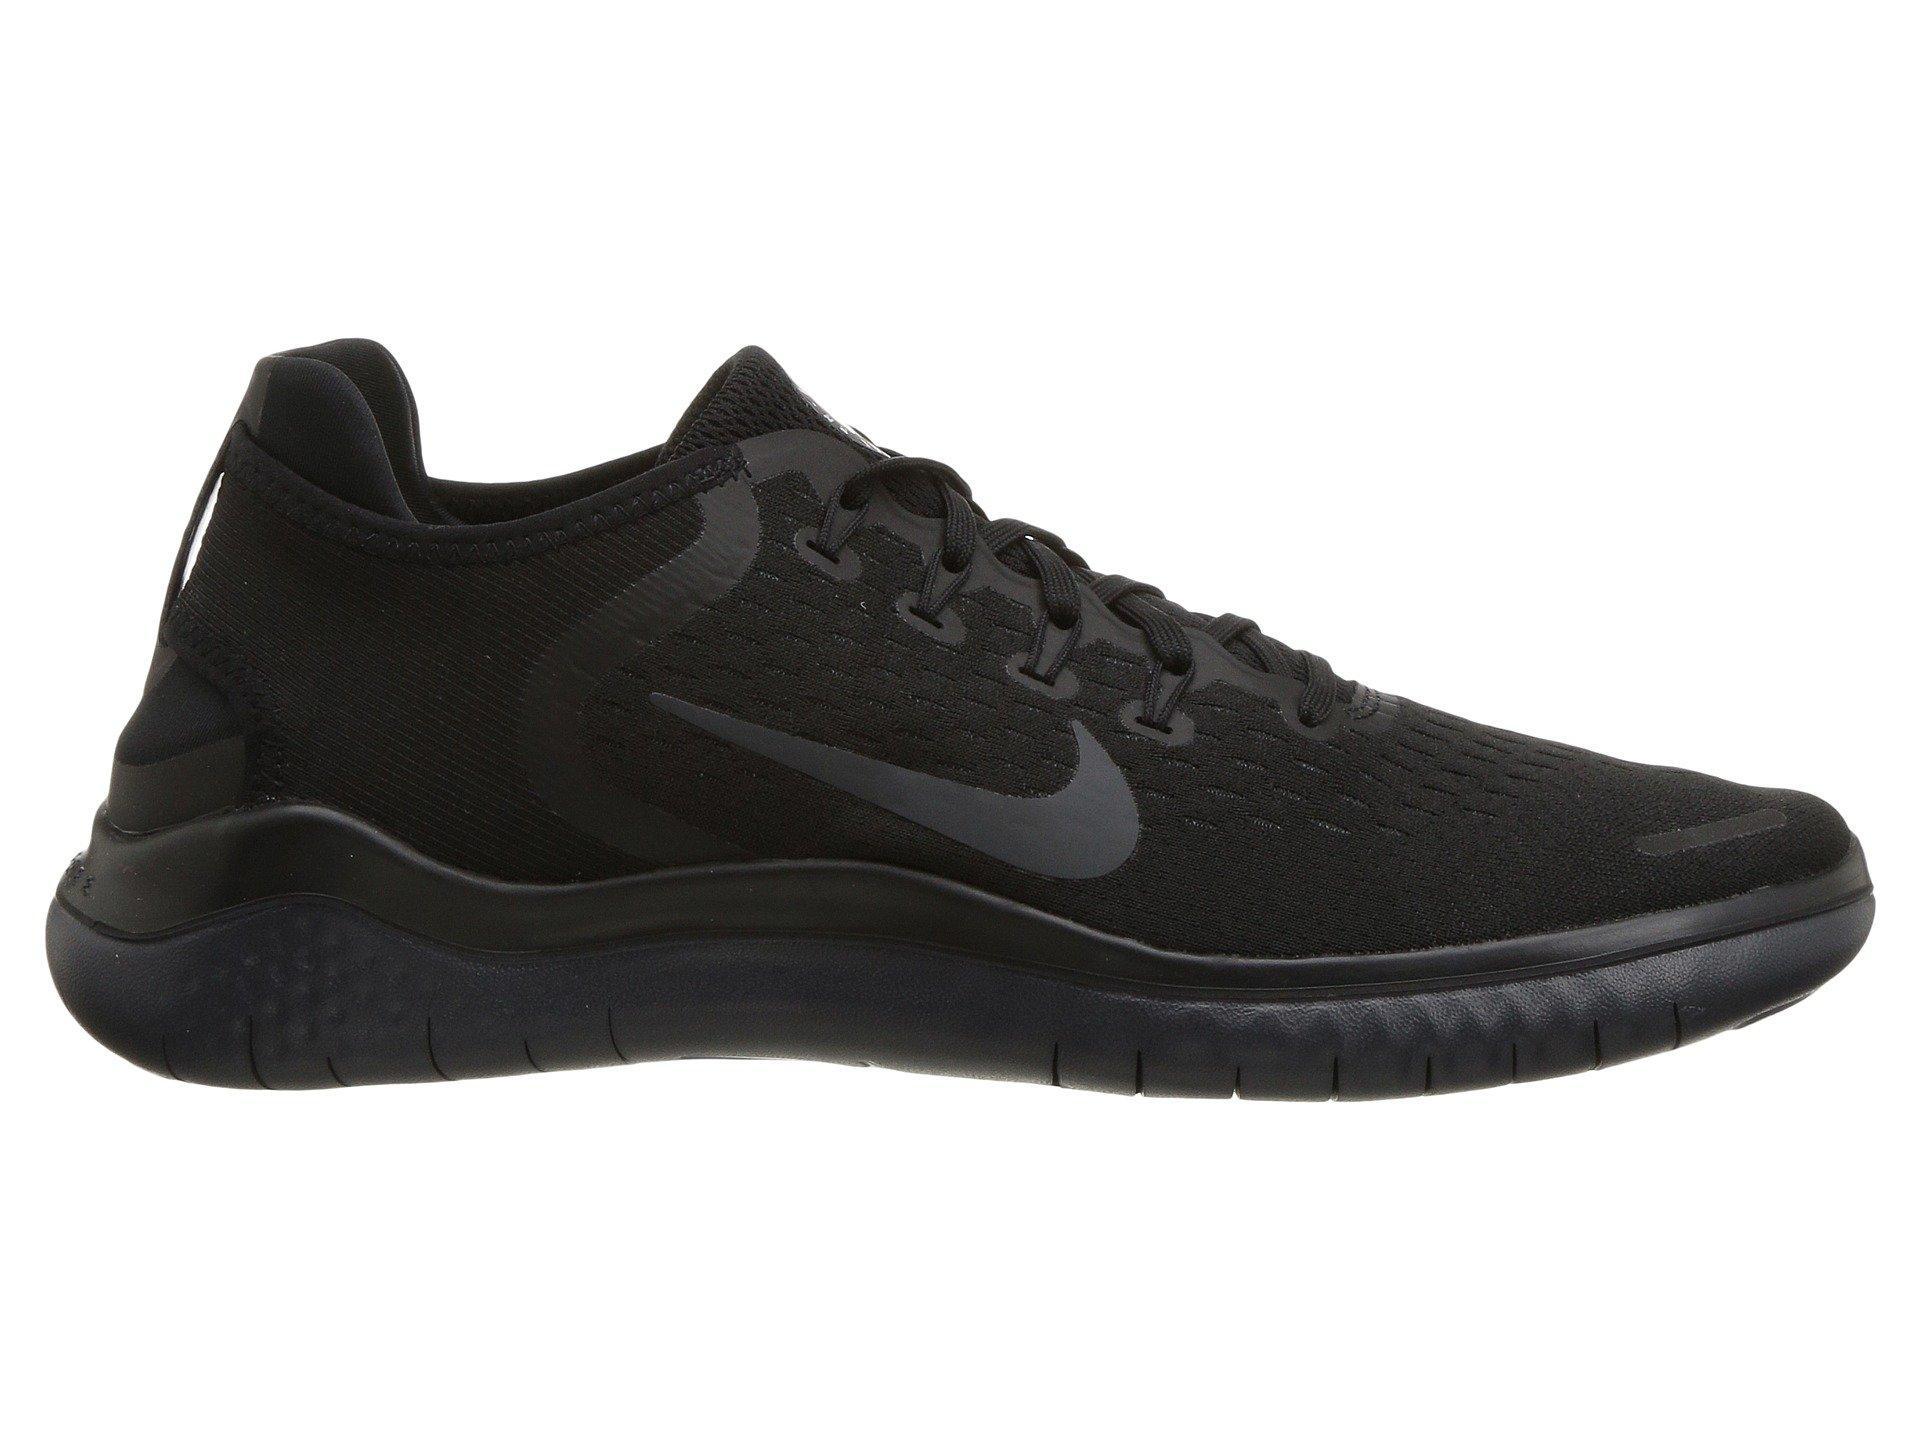 new style a29d0 41e36 Lyst - Nike Free Rn 2018 (black white) Men s Running Shoes in Black for Men